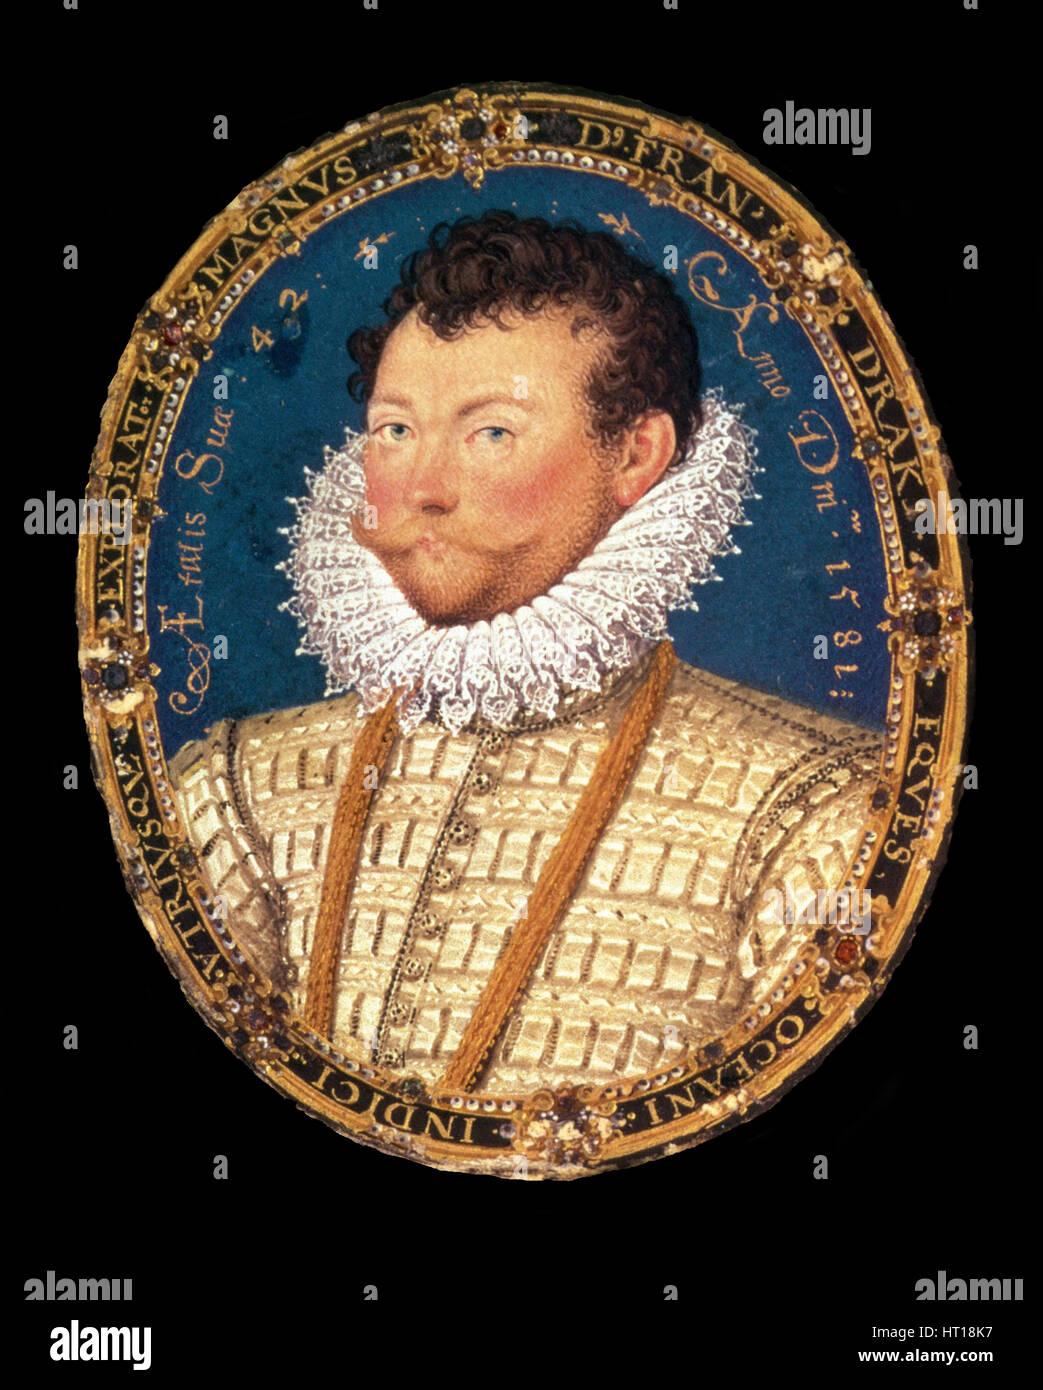 Portrait of Sir Francis Drake, 1581. Artist: Hilliard, Nicholas (c. 1547-1619) - Stock Image